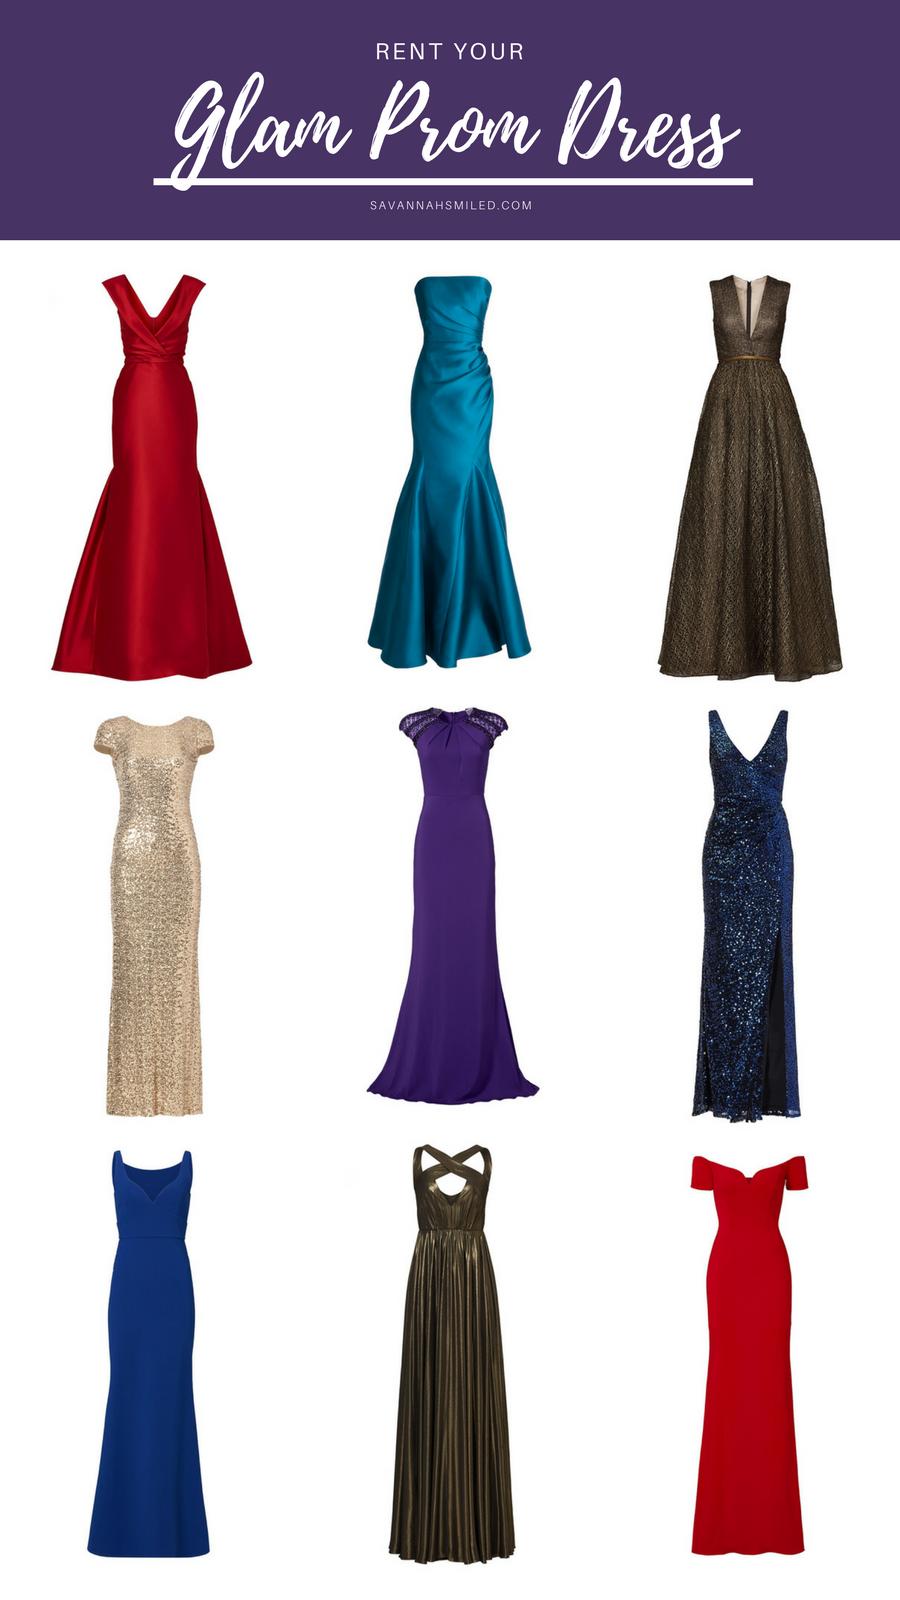 Rent The Glam Prom Dress Savannah Smiled